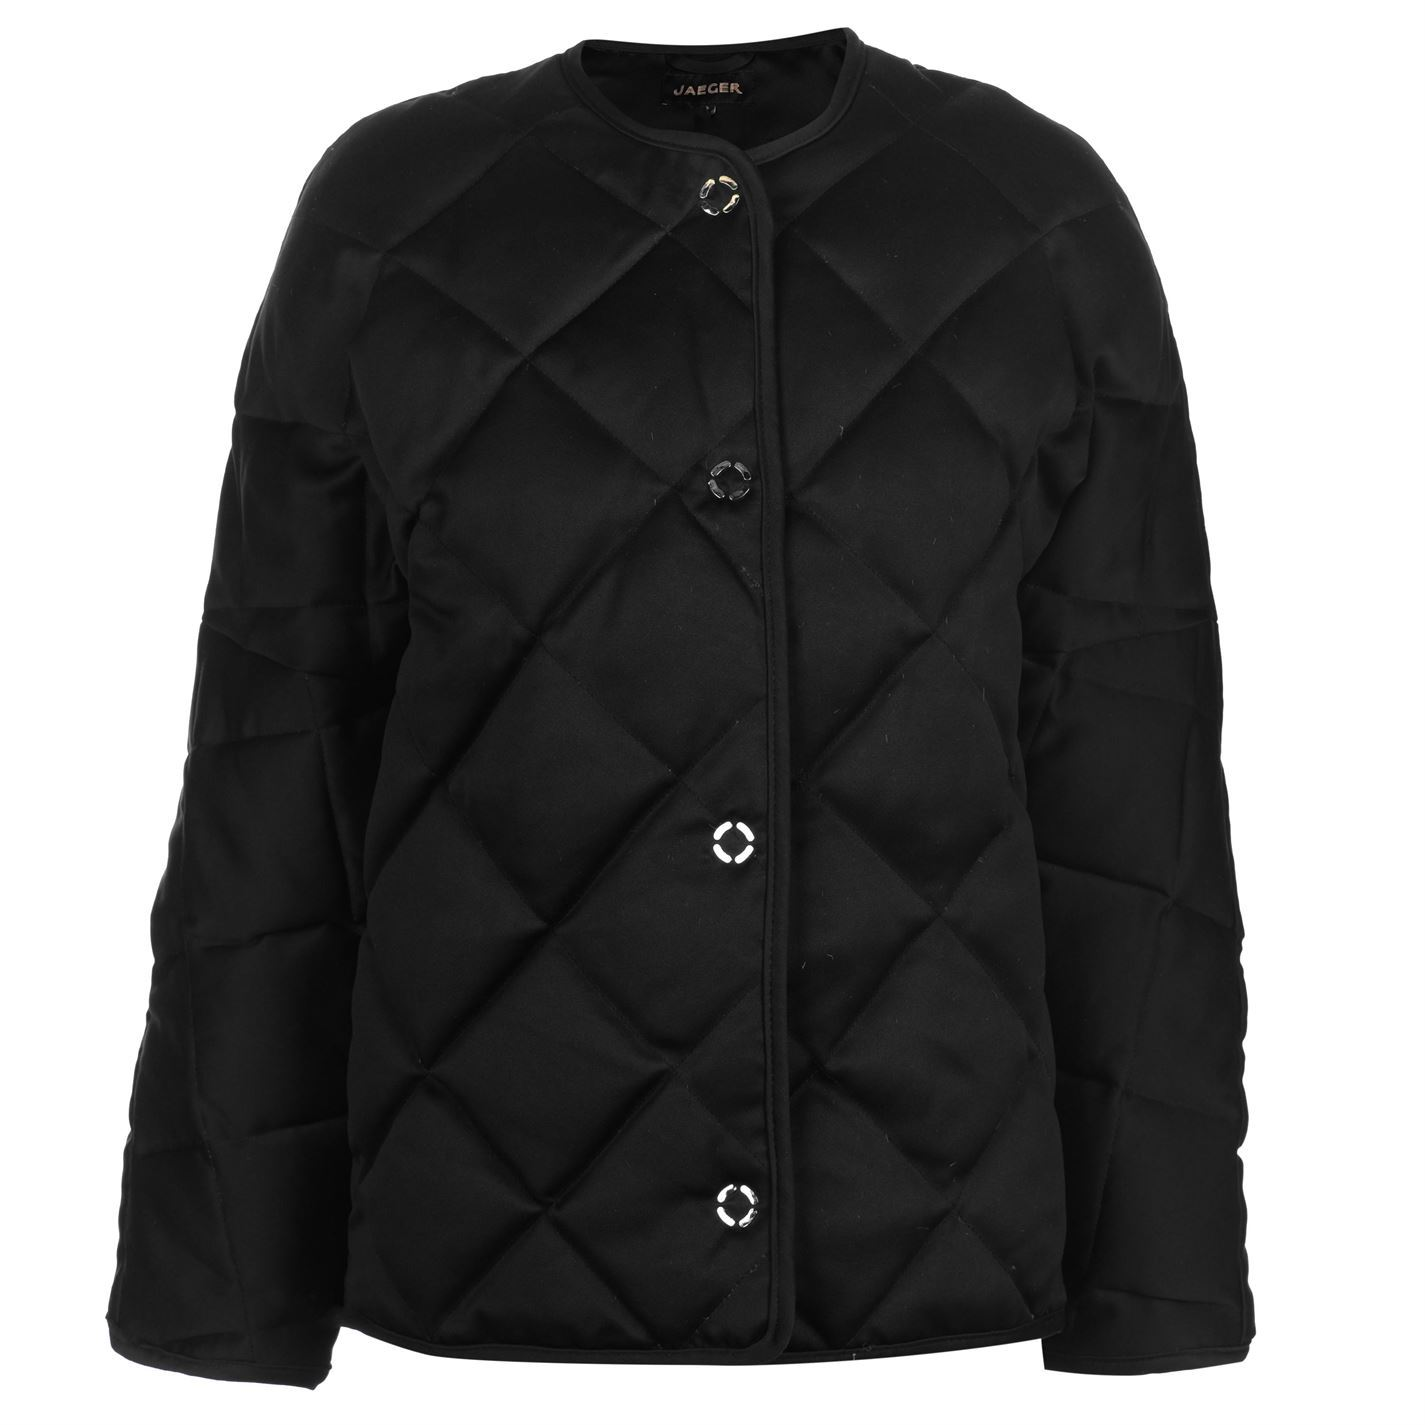 Jaeger-Jck-Lds-Ladies-Padded-Jacket-Coat-Top